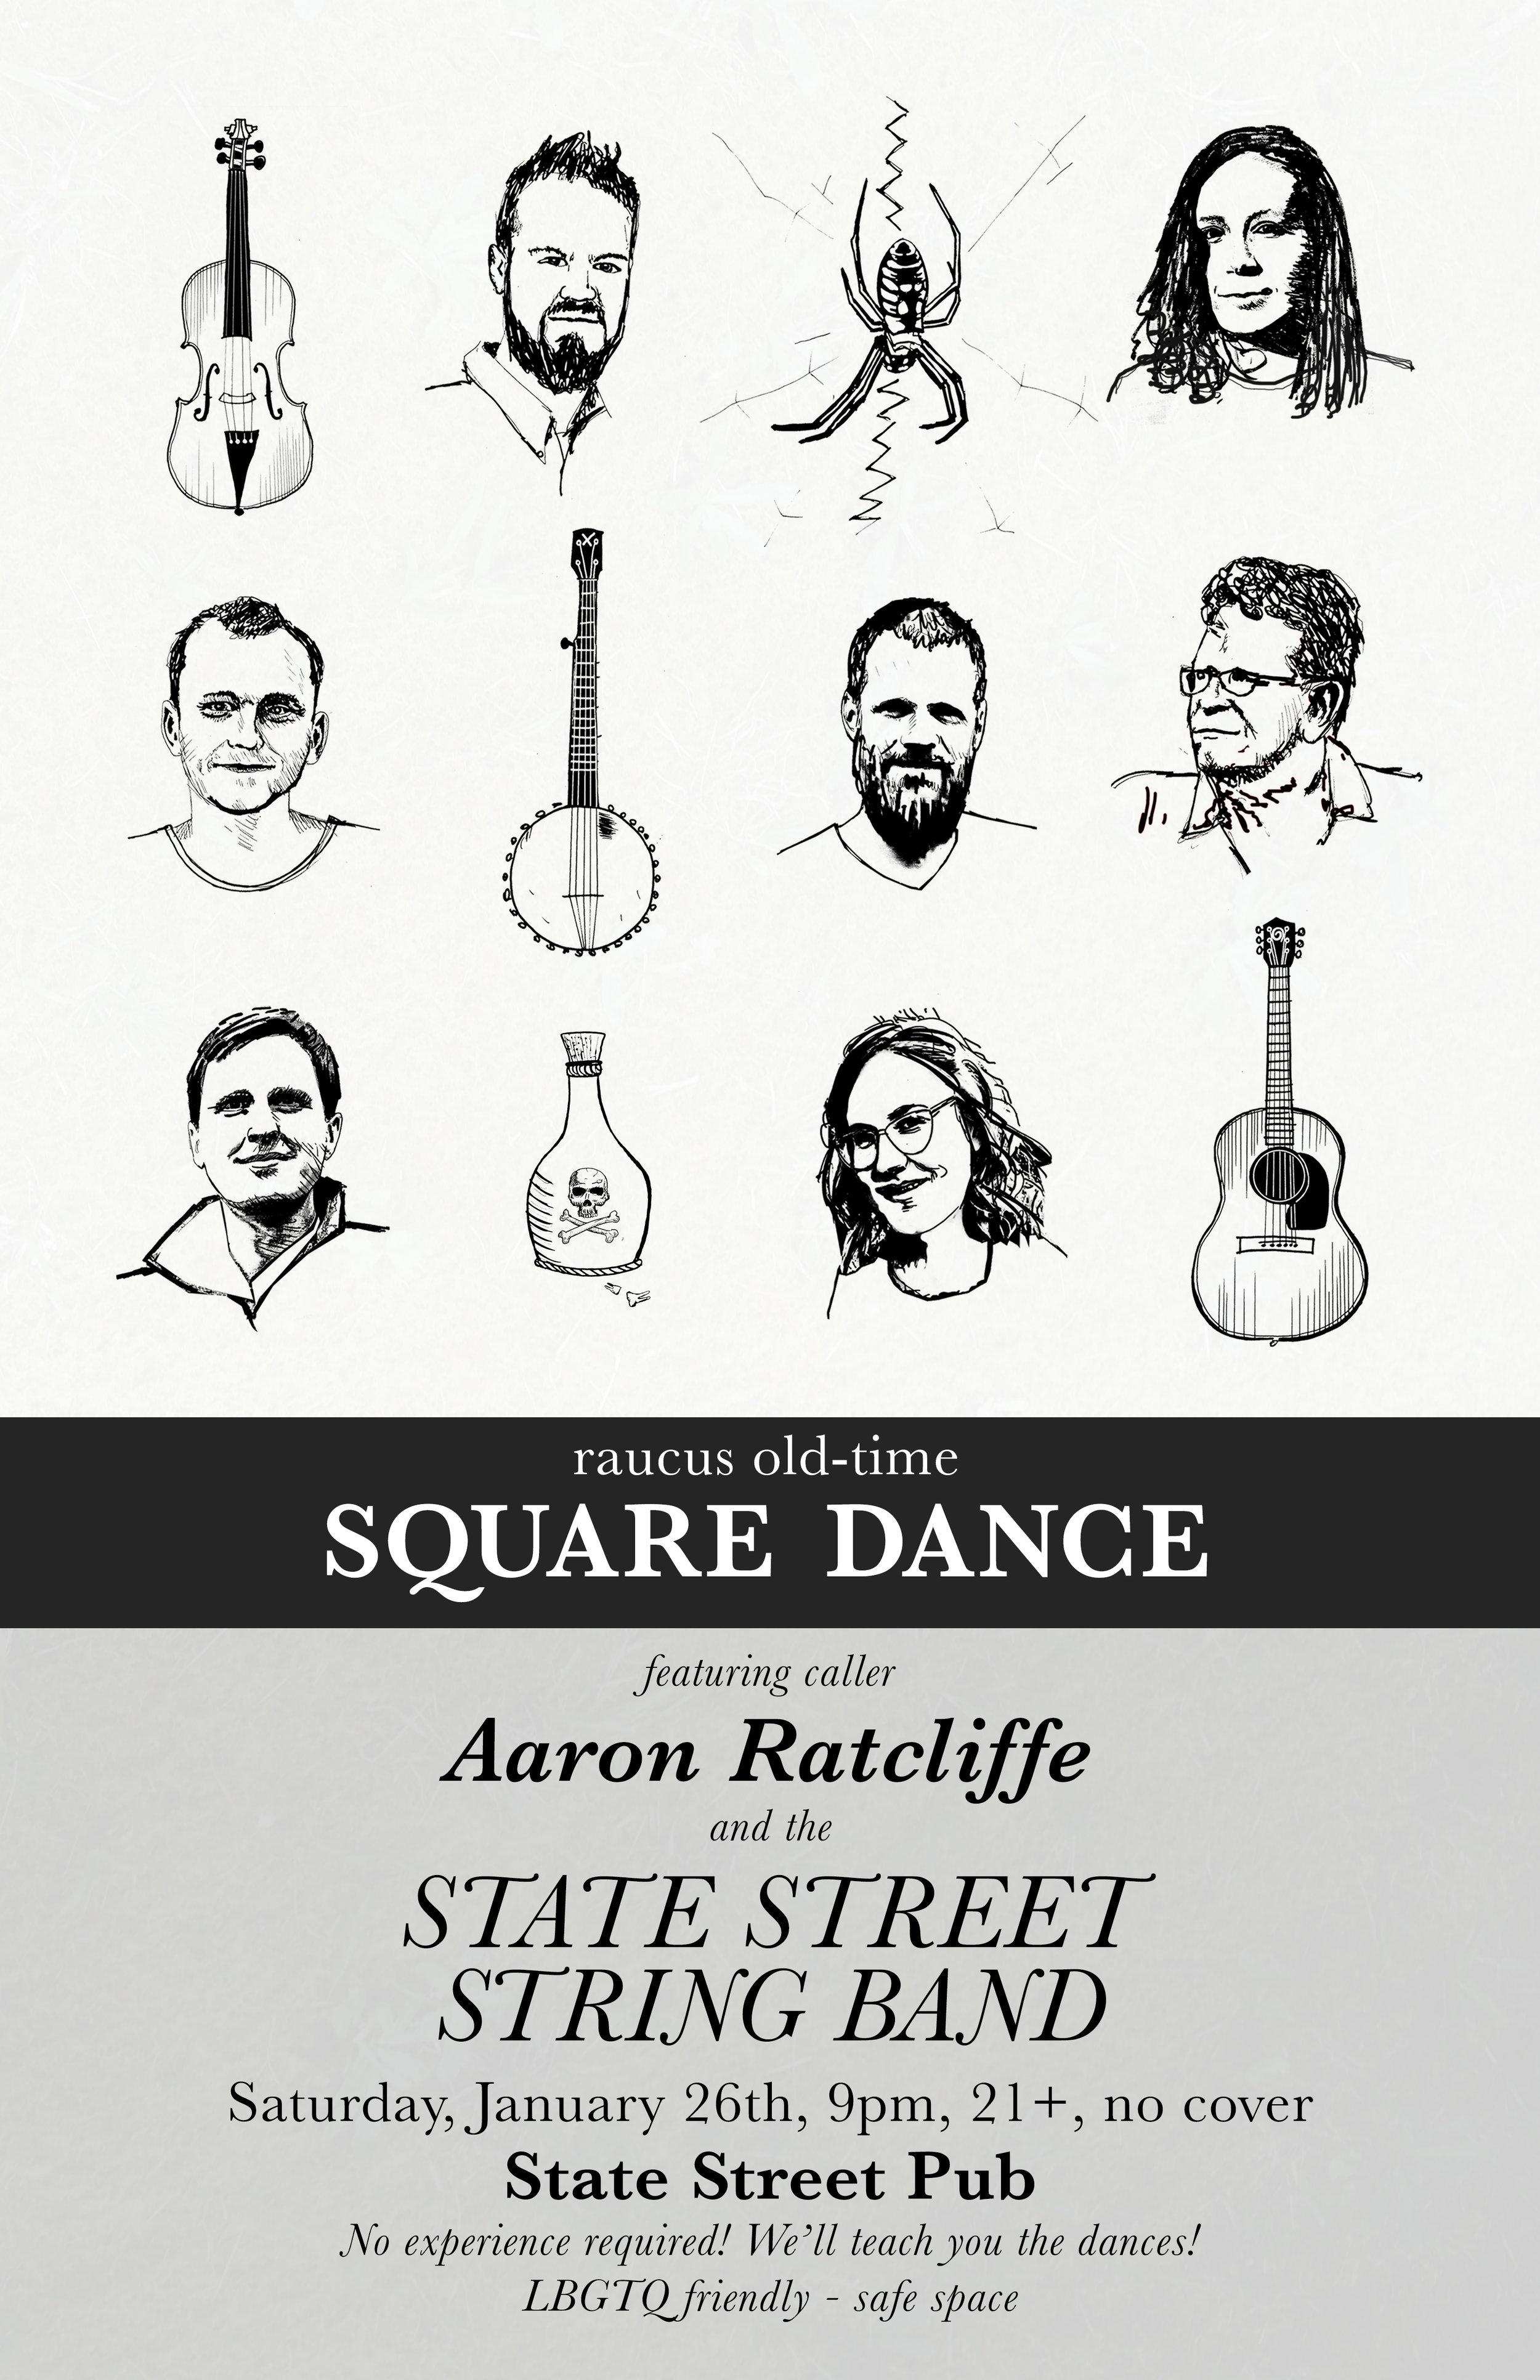 squaredanceposter1.jpg